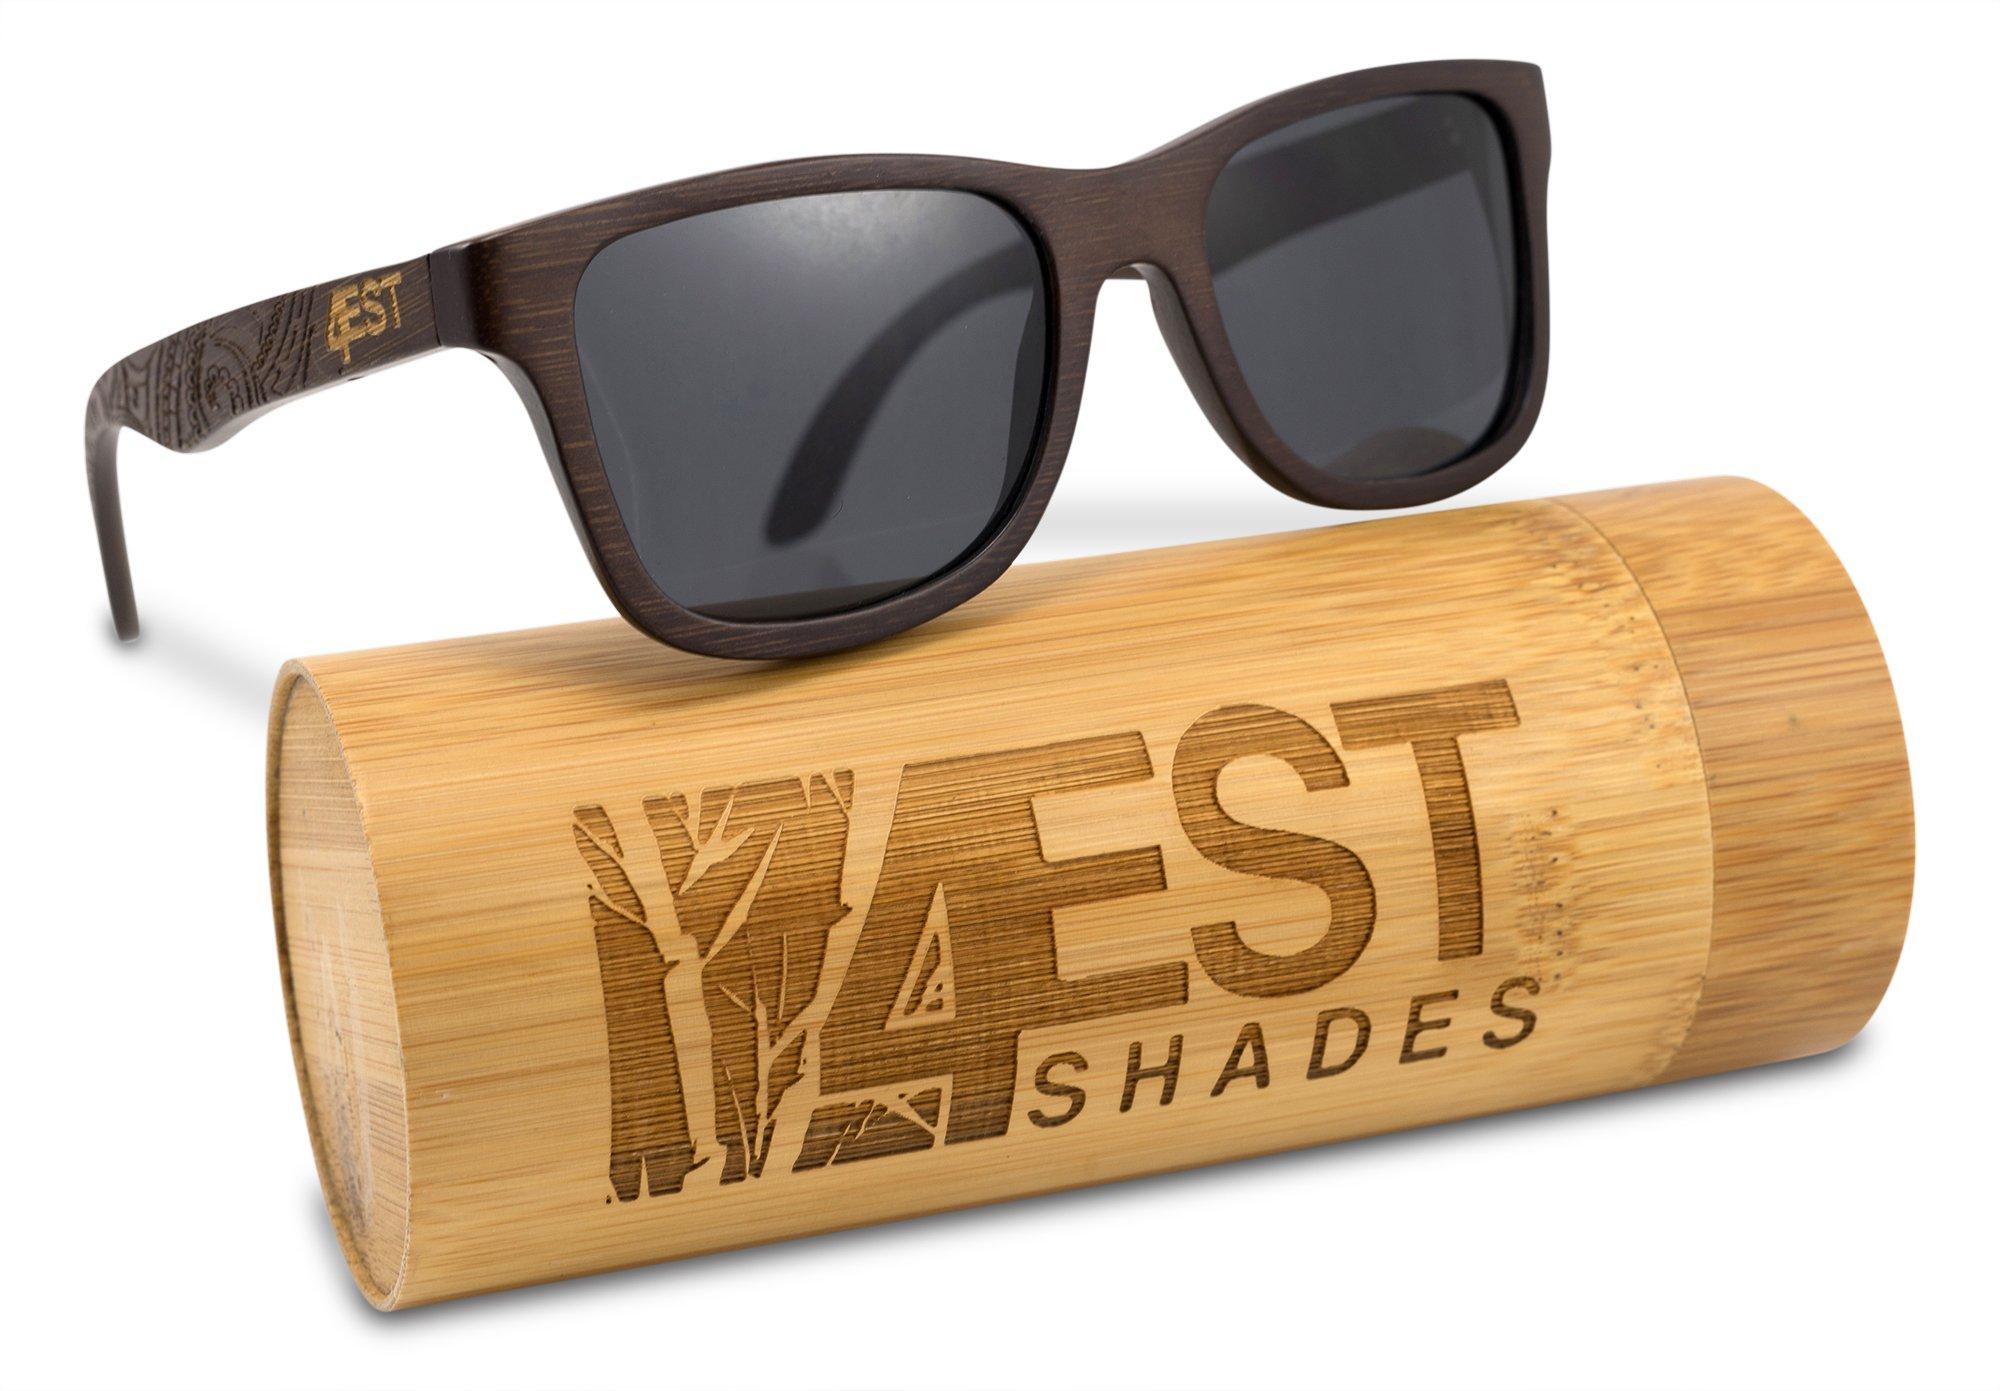 Bamboo Wood Sunglasses -Polarized handmade wooden shades in a wayfarer that Floats!